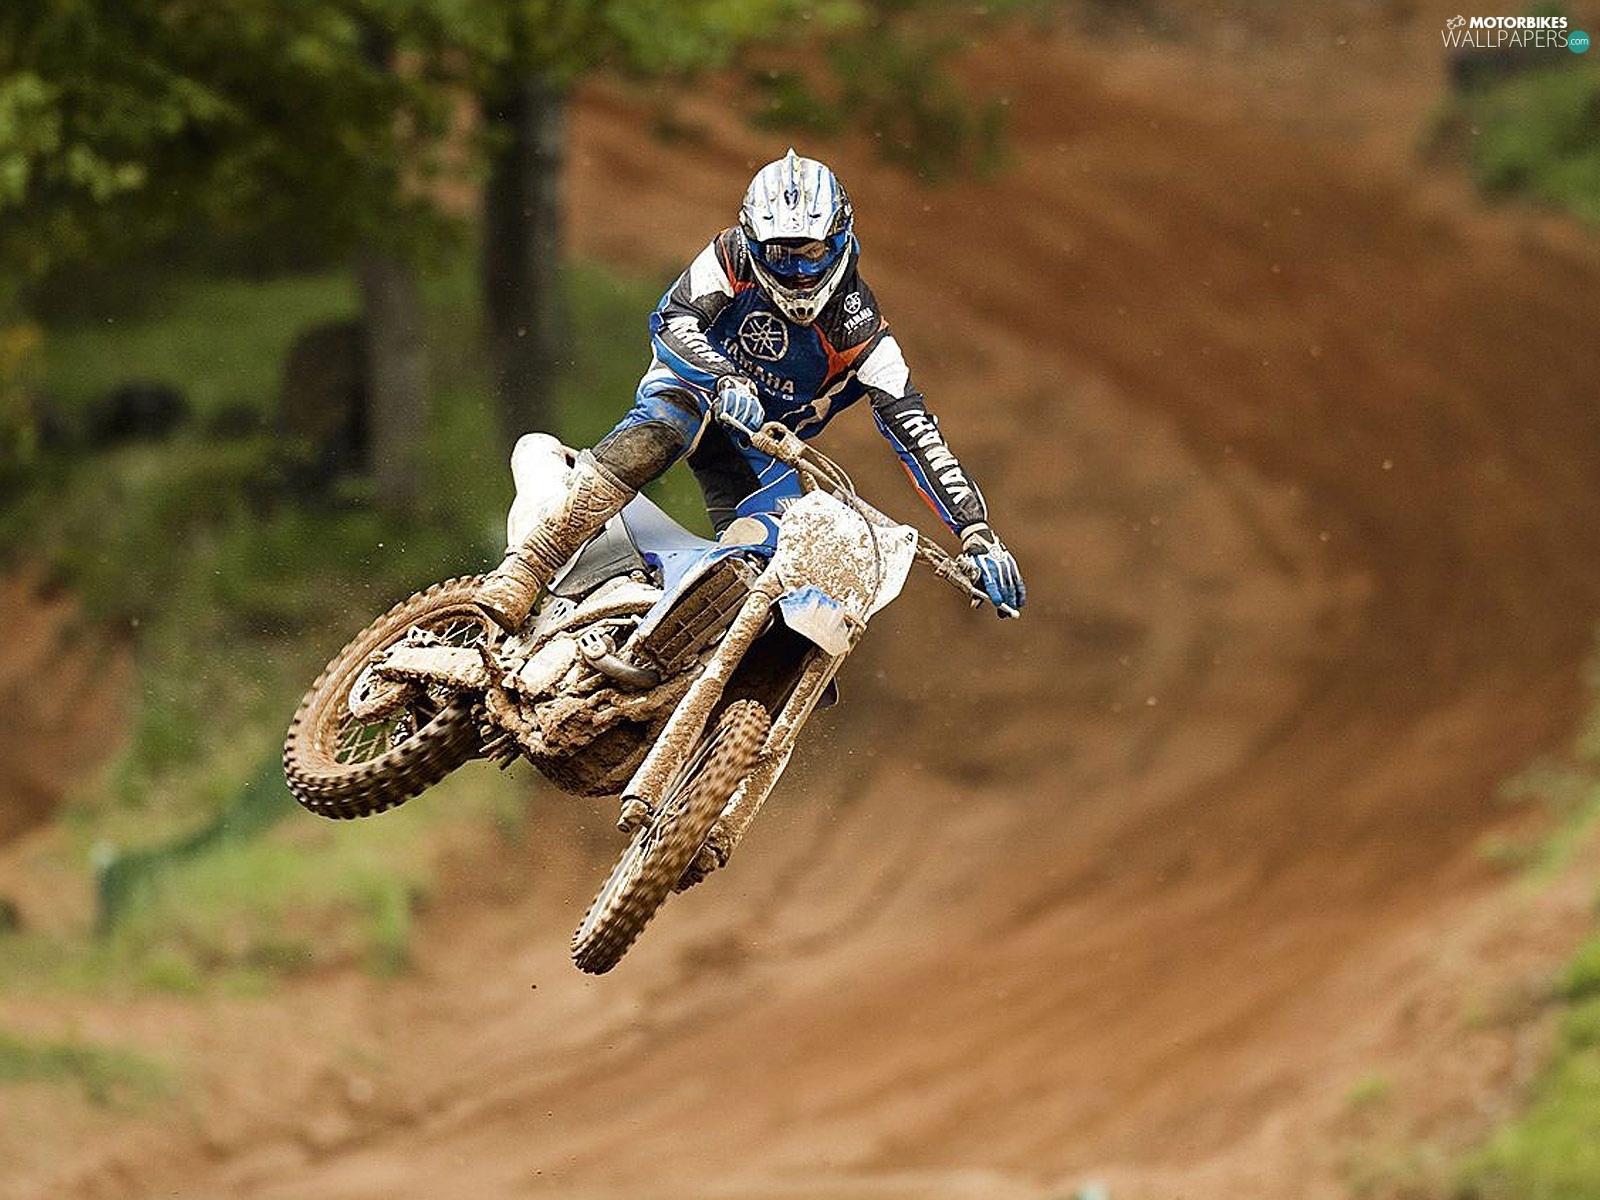 Track, Yamaha WR450F, Mud - Motorbikes wallpapers: 1600x1200